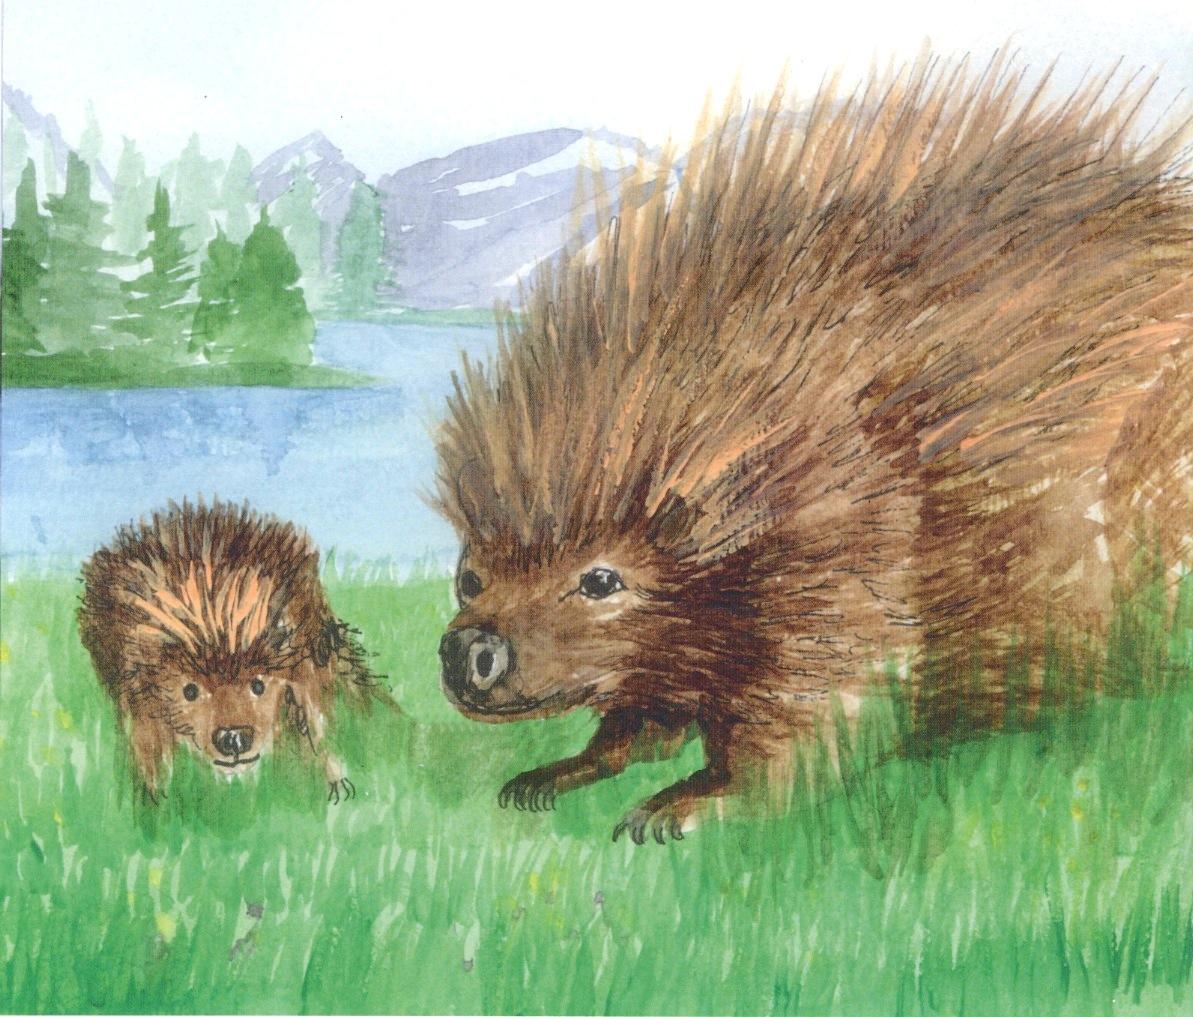 ecofriendly sask canadian animal stories for children